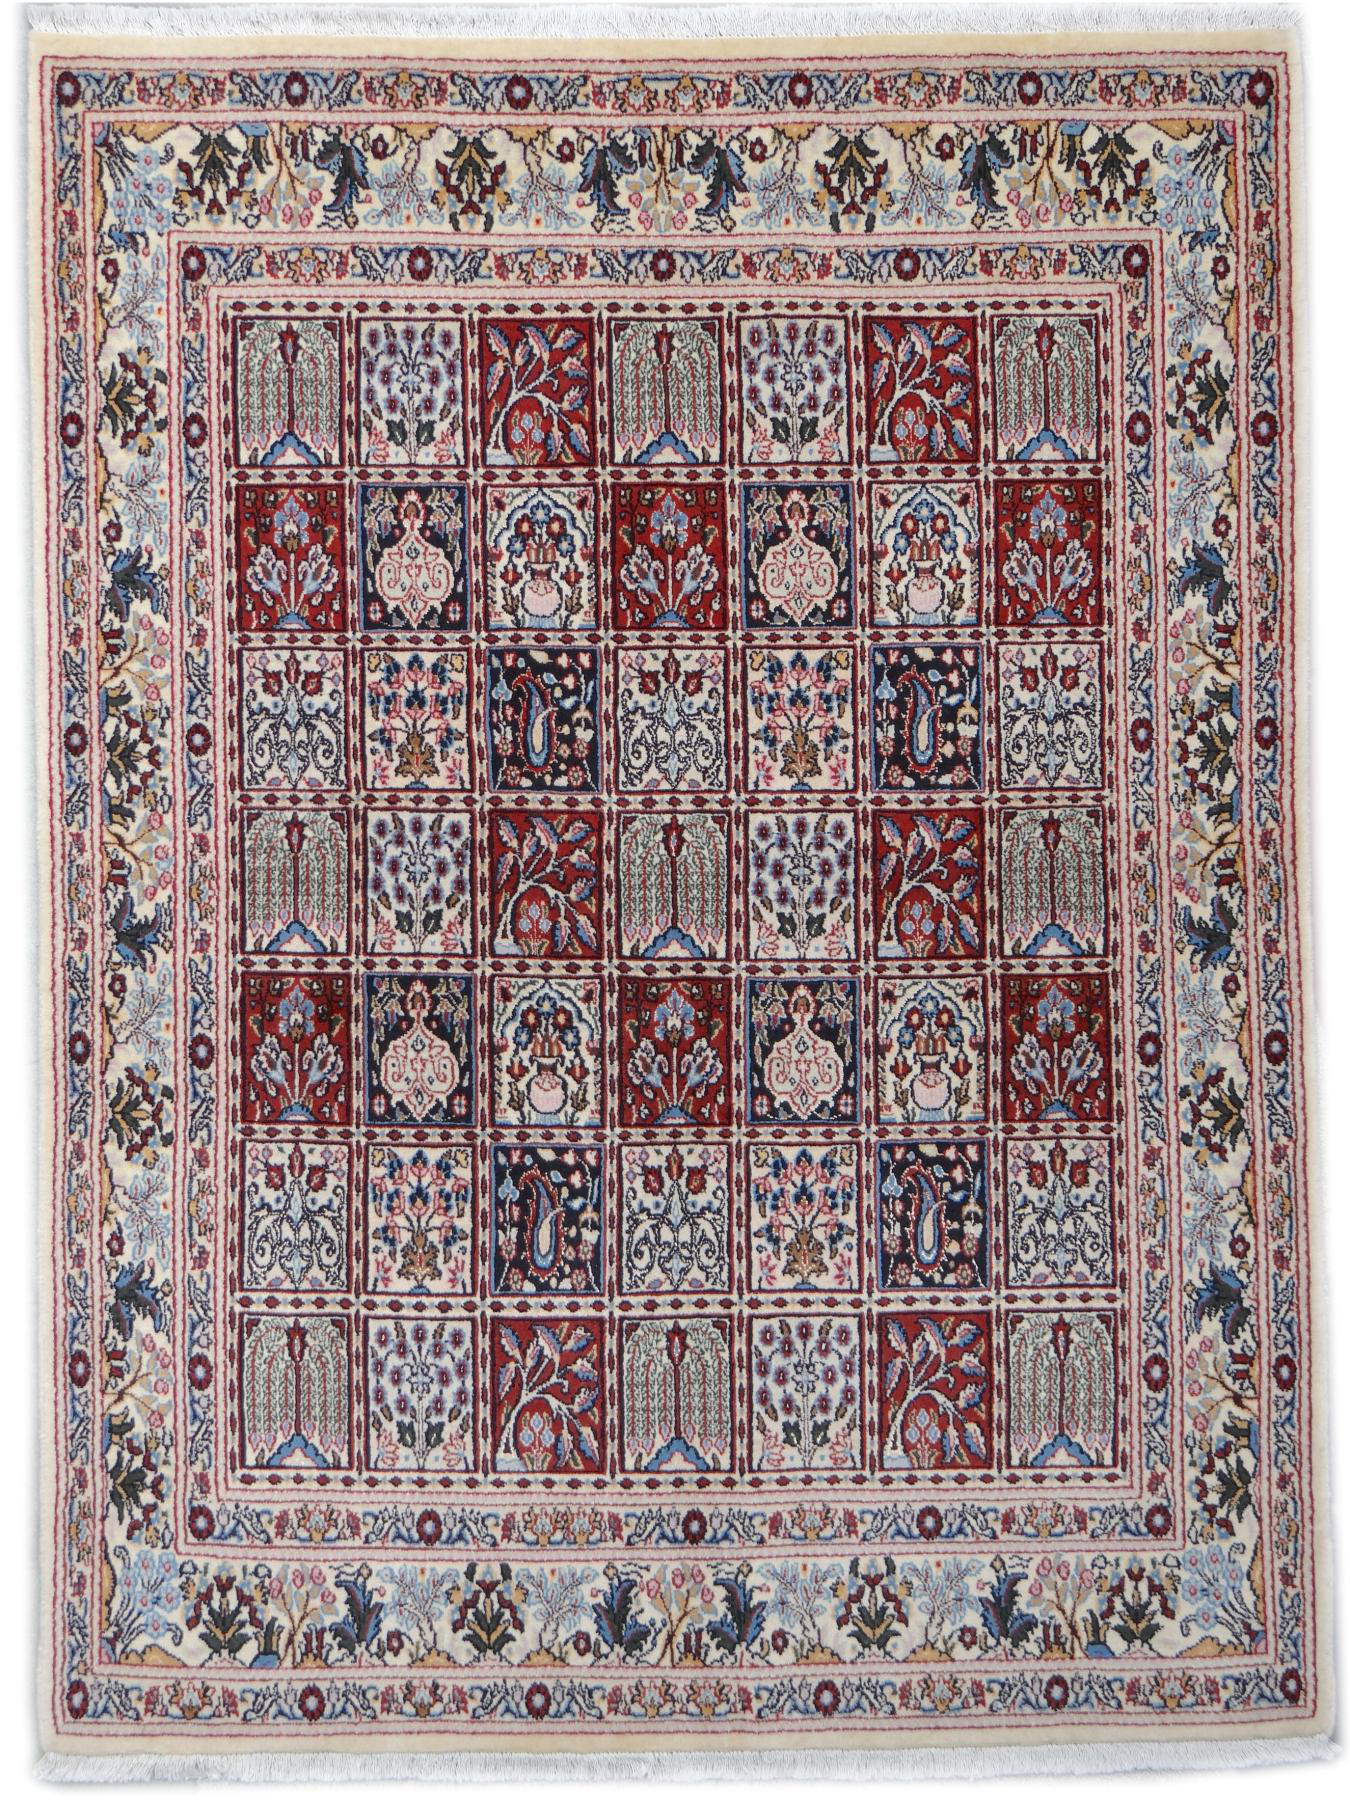 Moud Garden Persian Carpets N 2384 199x150cm